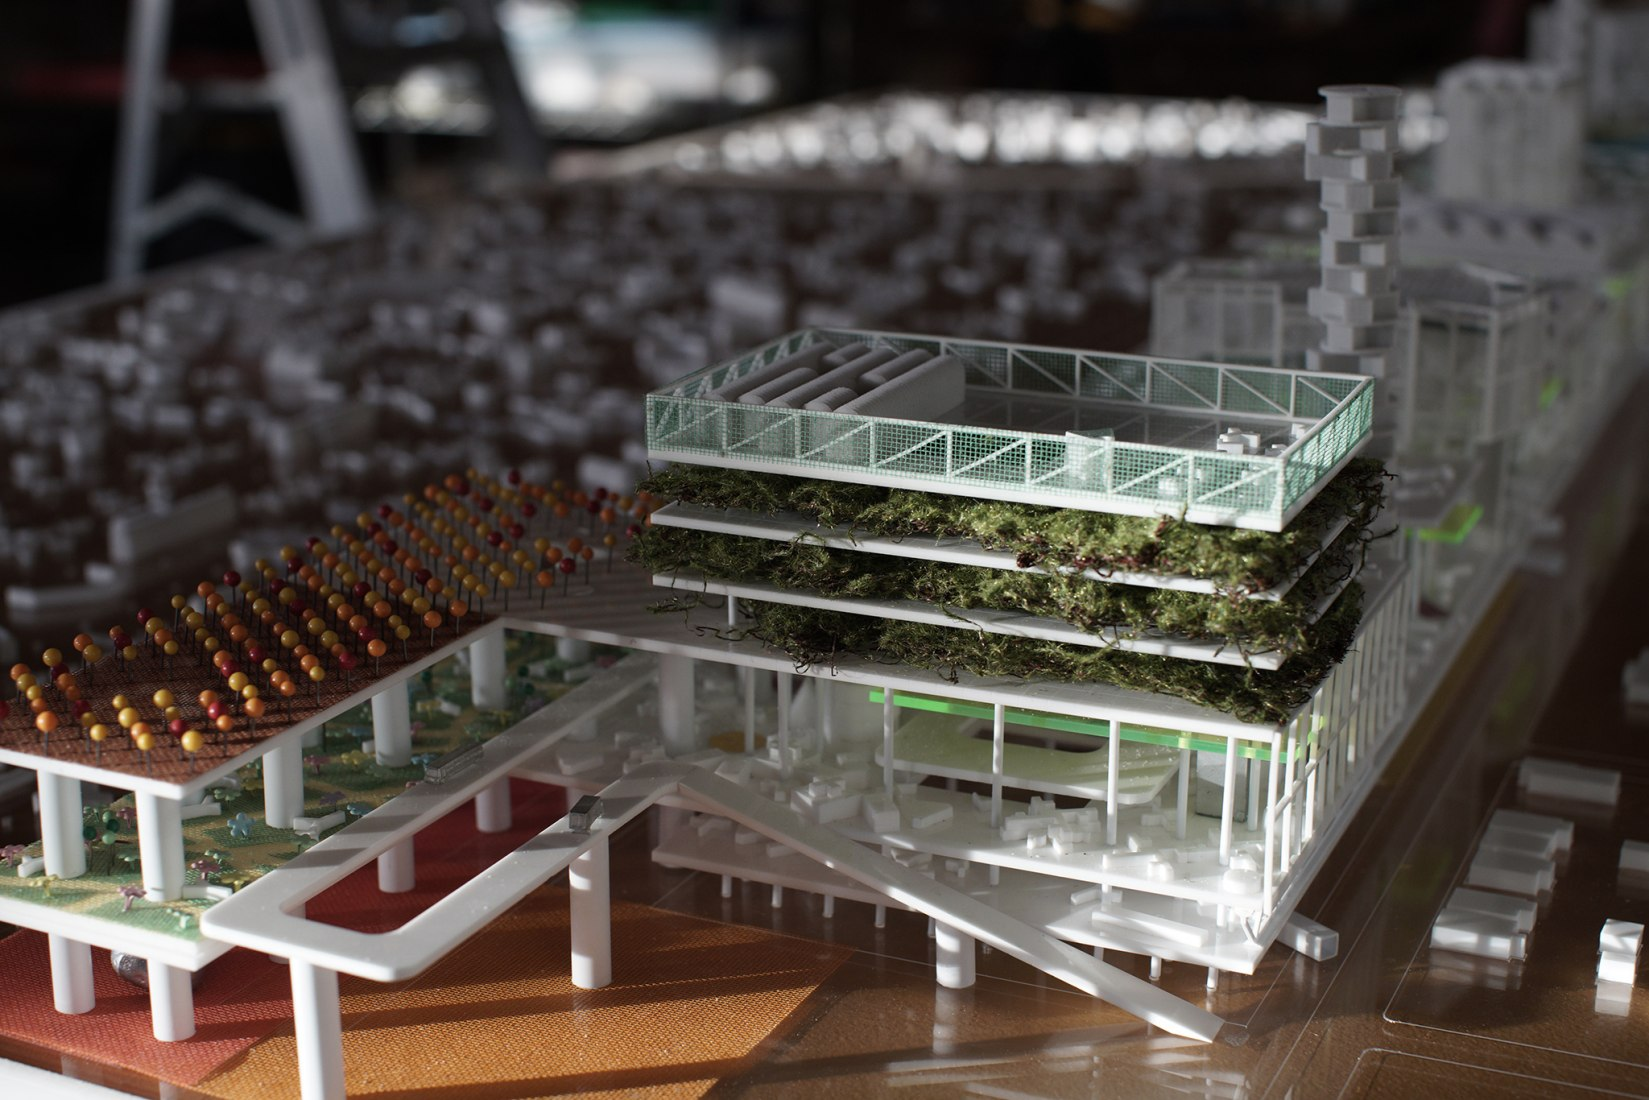 Model. Detroit Rock City: a vertical botanic garden by Stan Allen Architect. Photograph courtesy of Stan Allen.